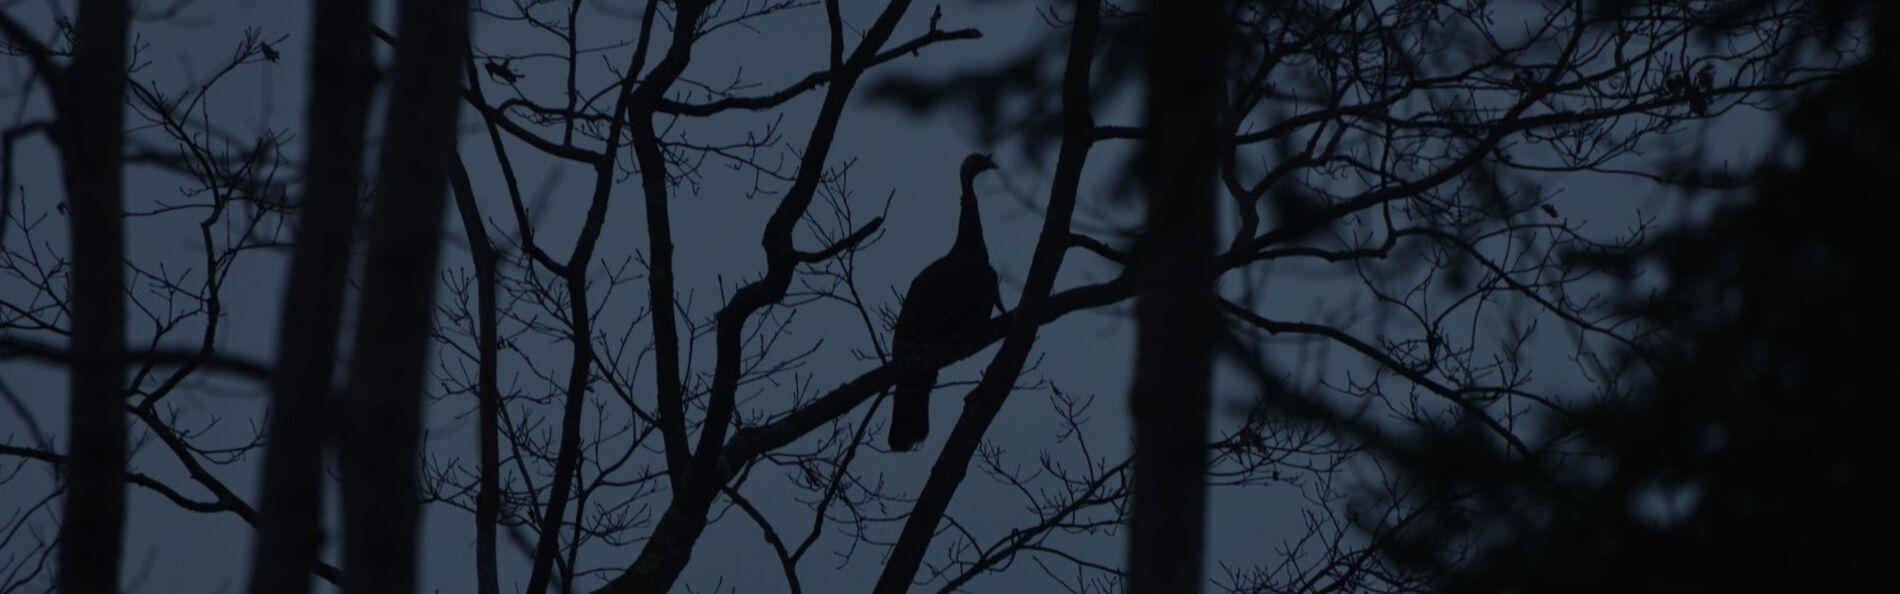 Turkey sitting up in a tree